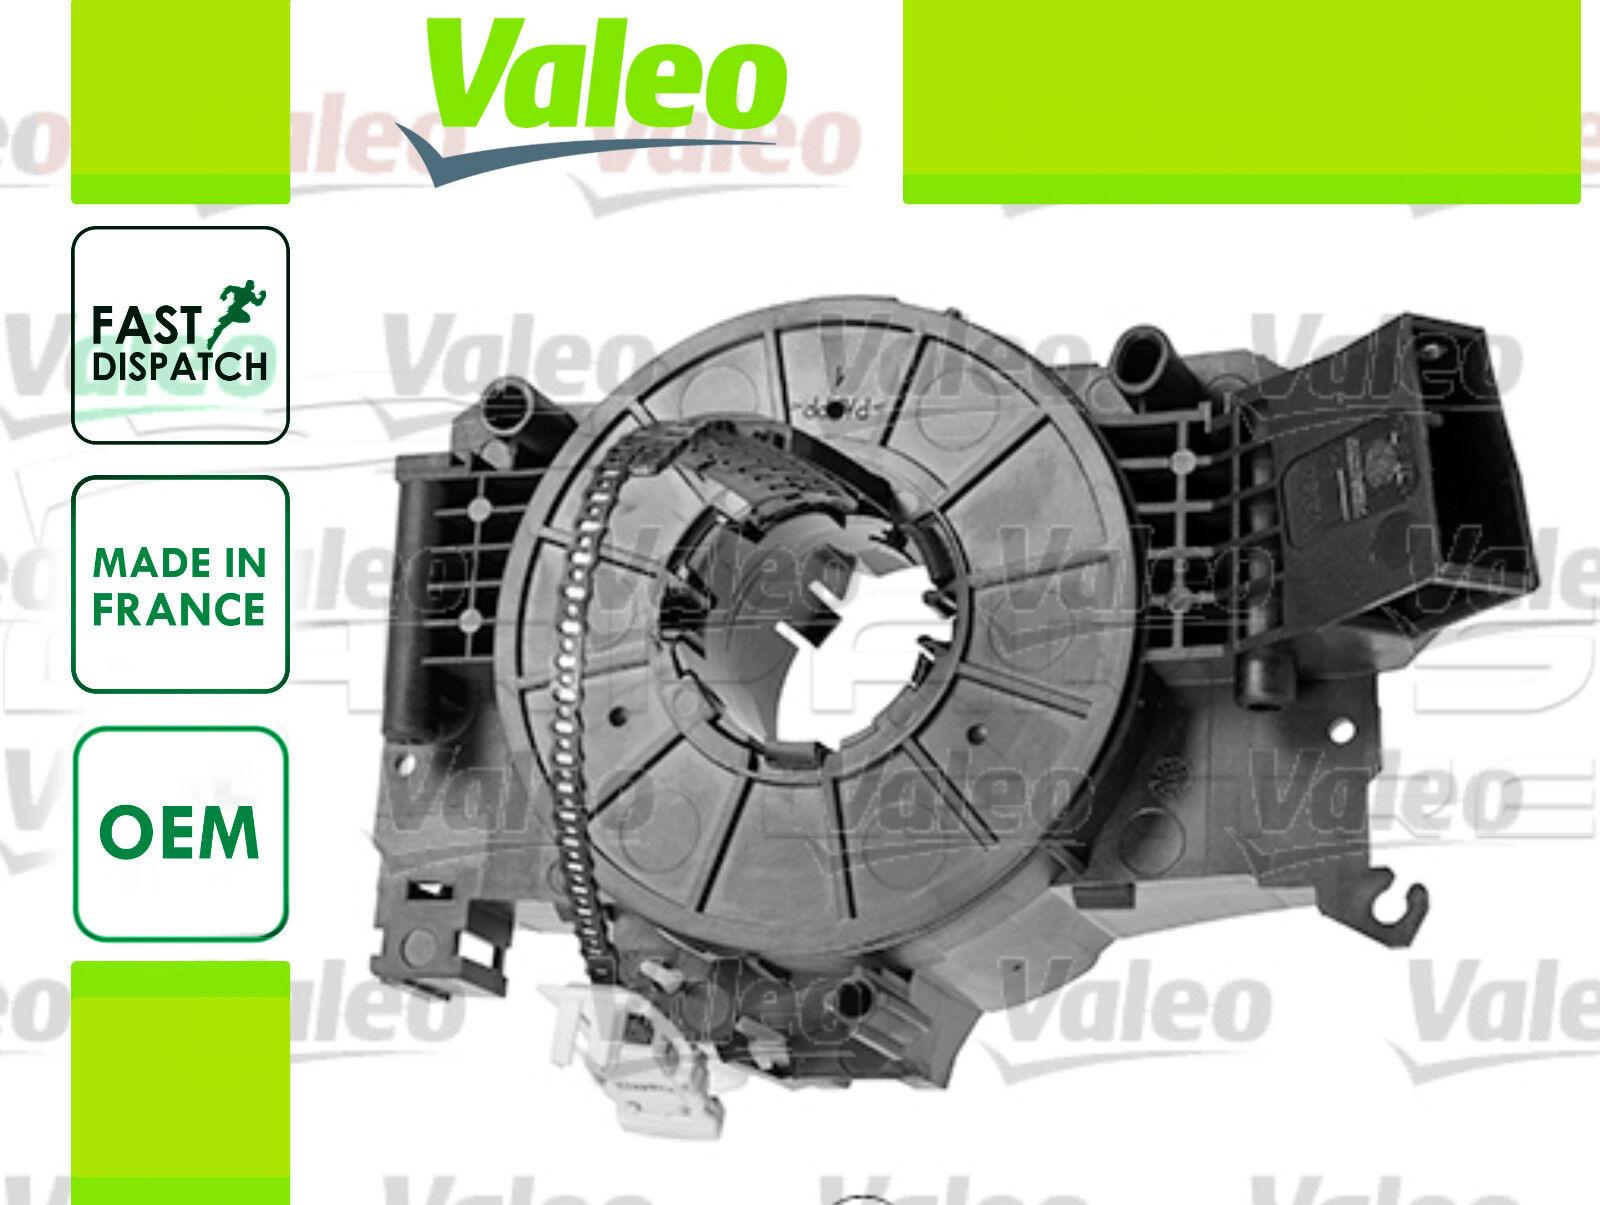 VXR Velocímetro propulsión tachoschnecke eléctricamente Gilera Runner vx 34 mm Runner RST